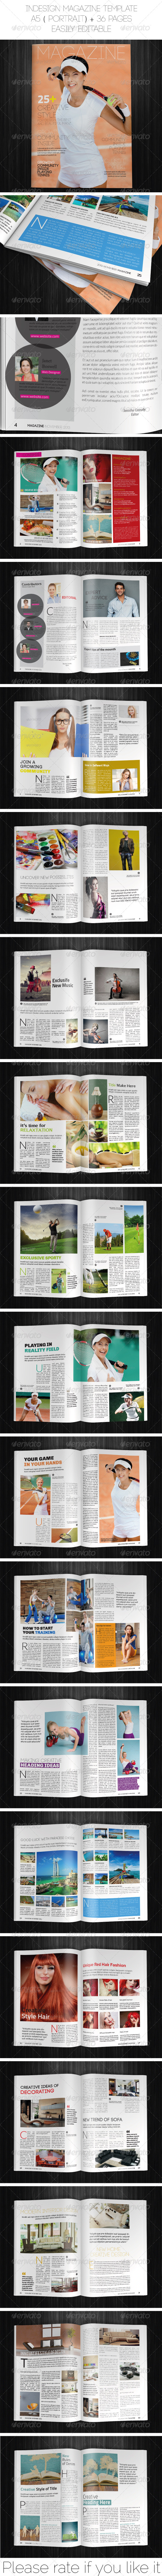 A5 Portrait Magazine Template - Magazines Print Templates